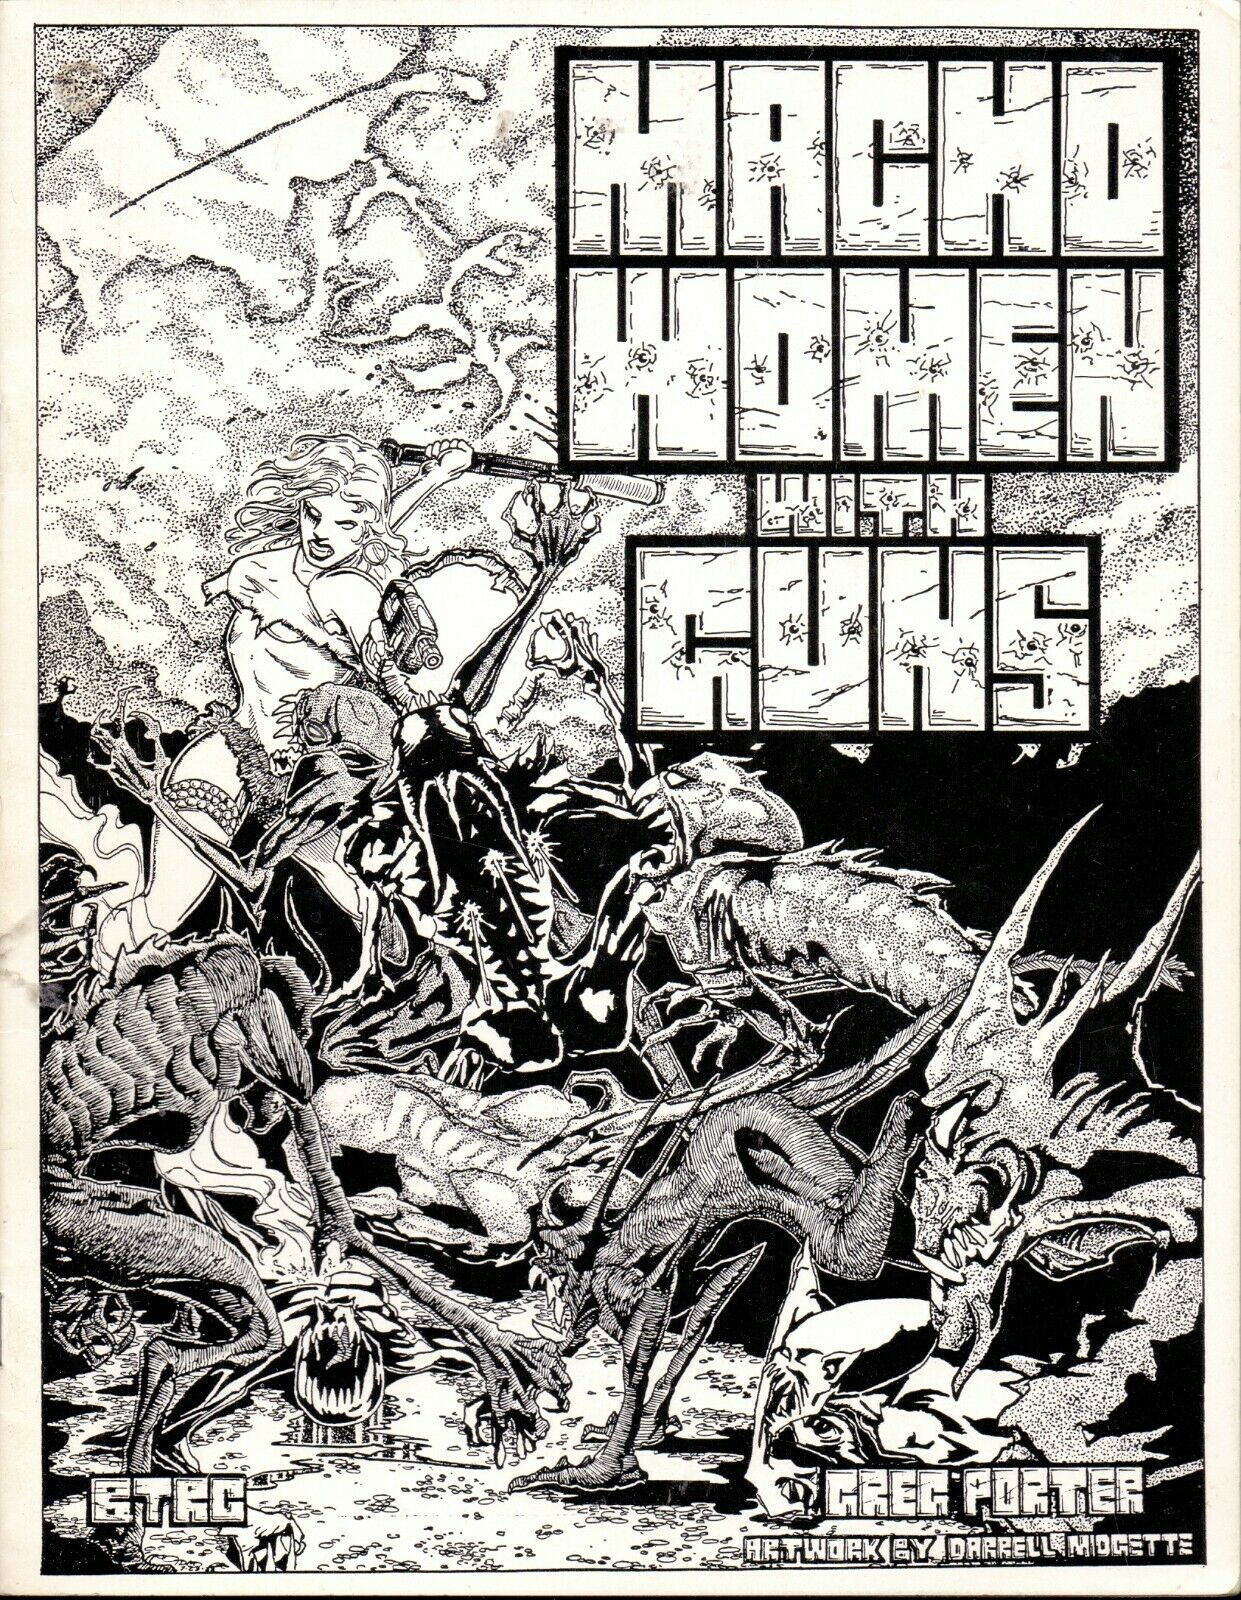 JDR RPG JEU DE ROLE   BTRC MACHO WOMEN WITH GUNS 4 LIVRETS 1988 1990